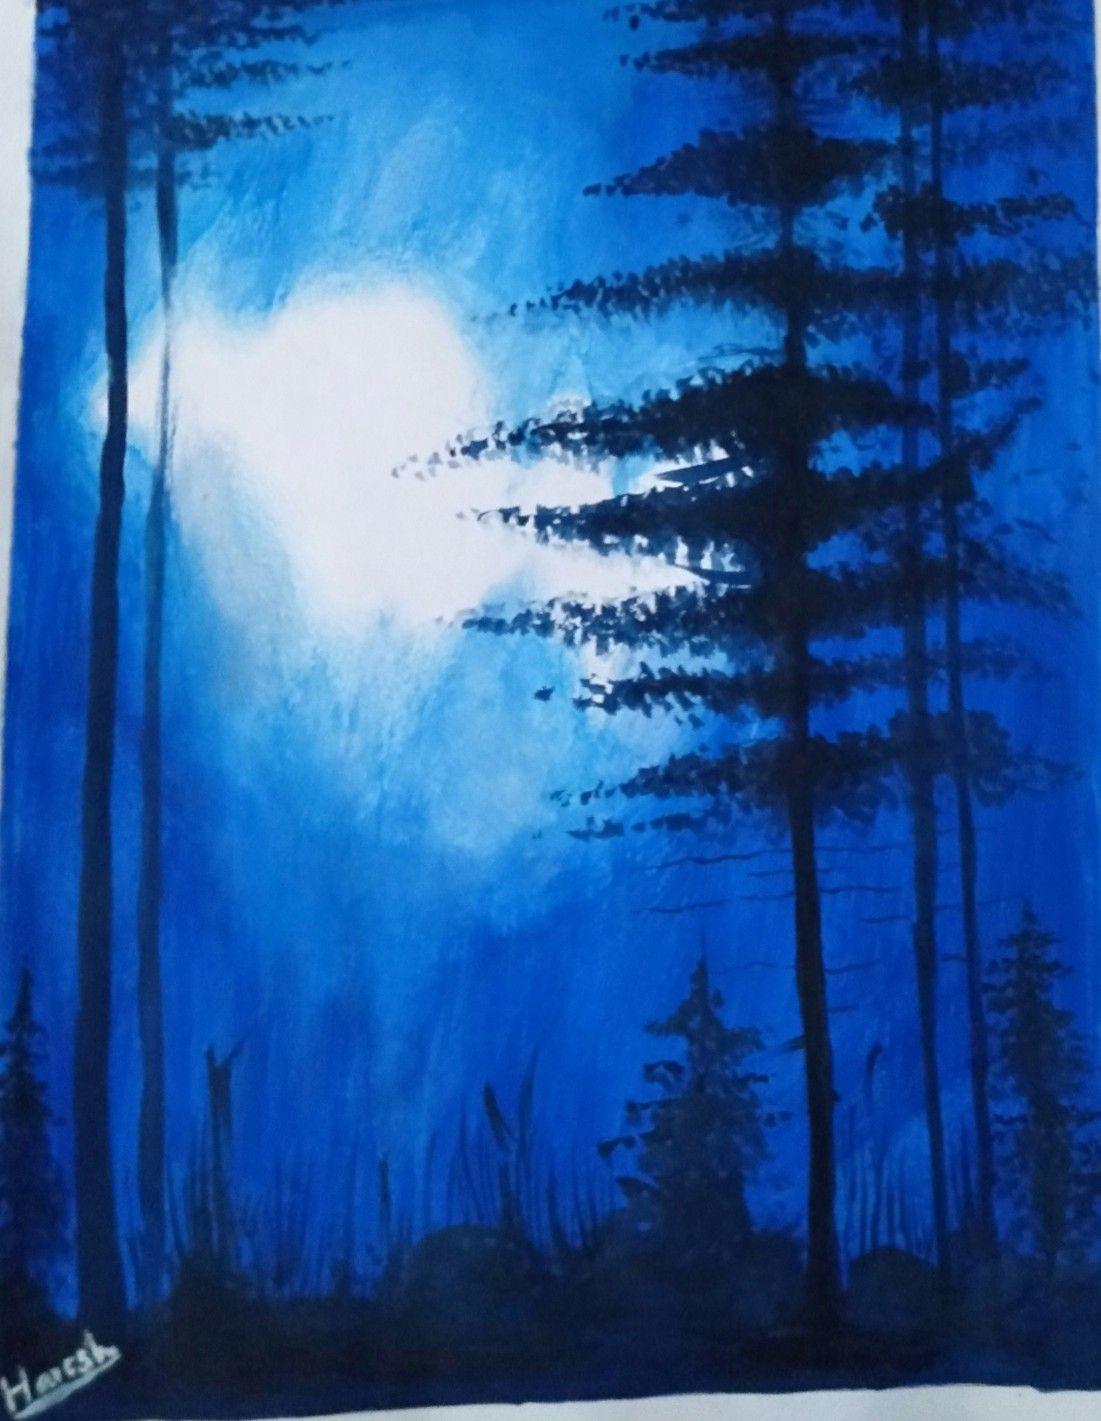 Night Mode Scenery By Haresh Sahani Scenery Artwork Painting